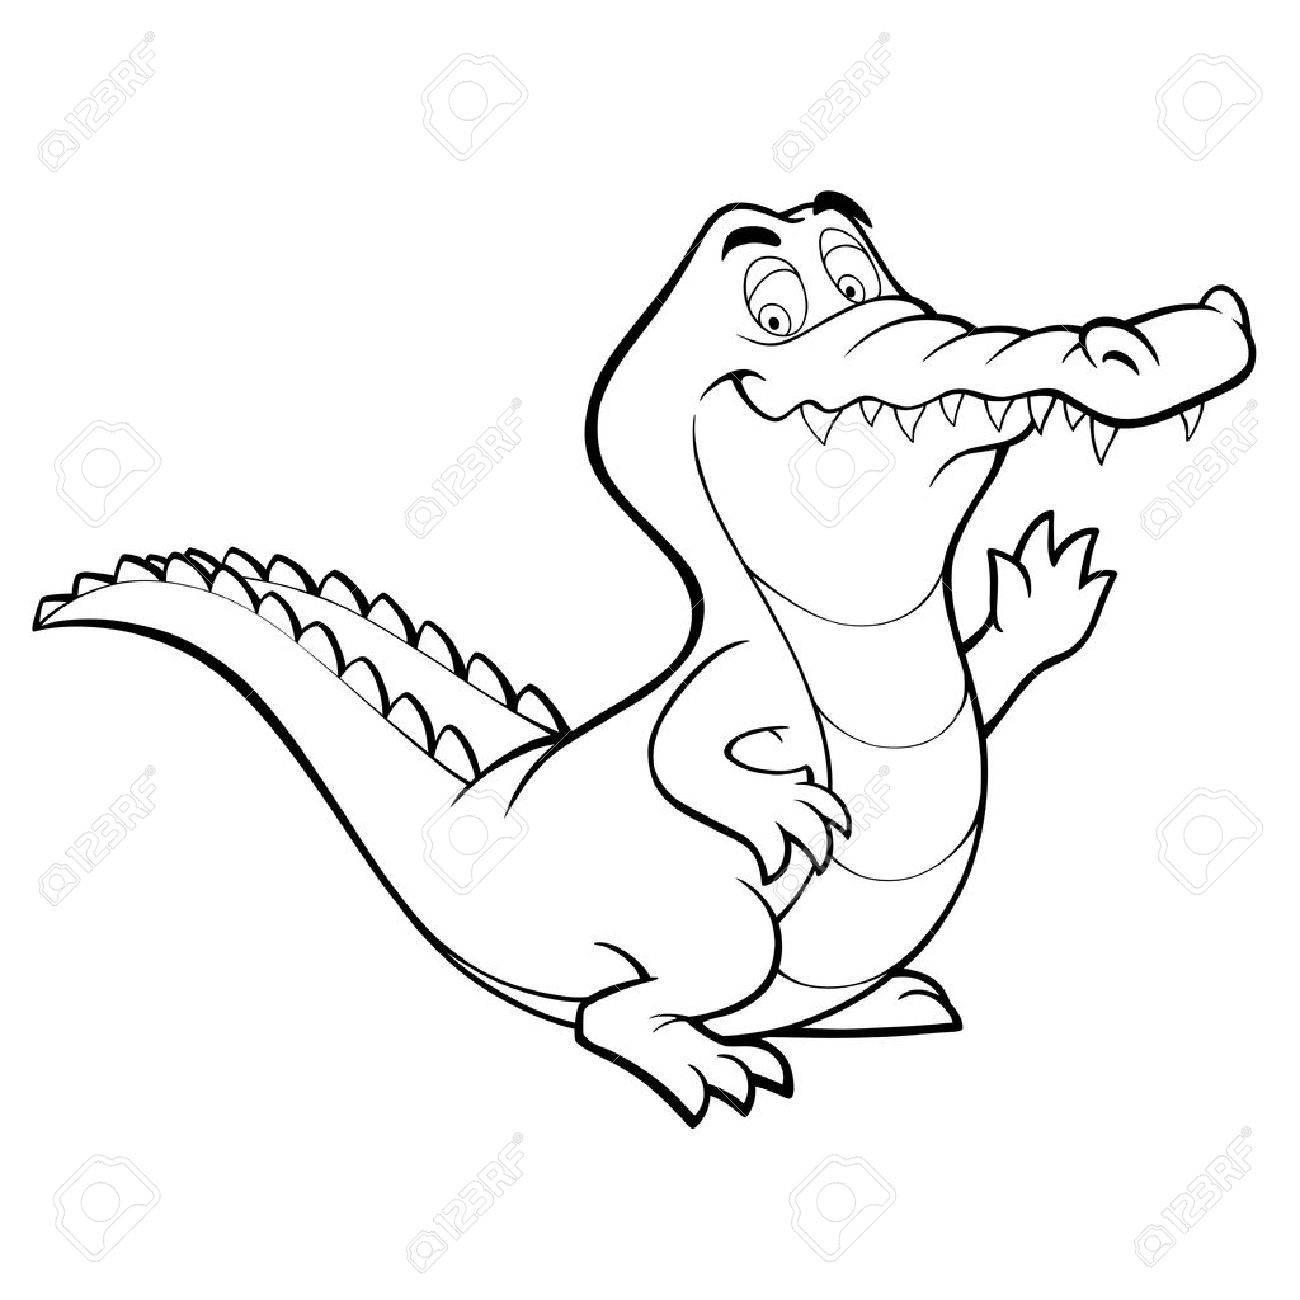 crocodile cartoon alligator line art coloring book black and...